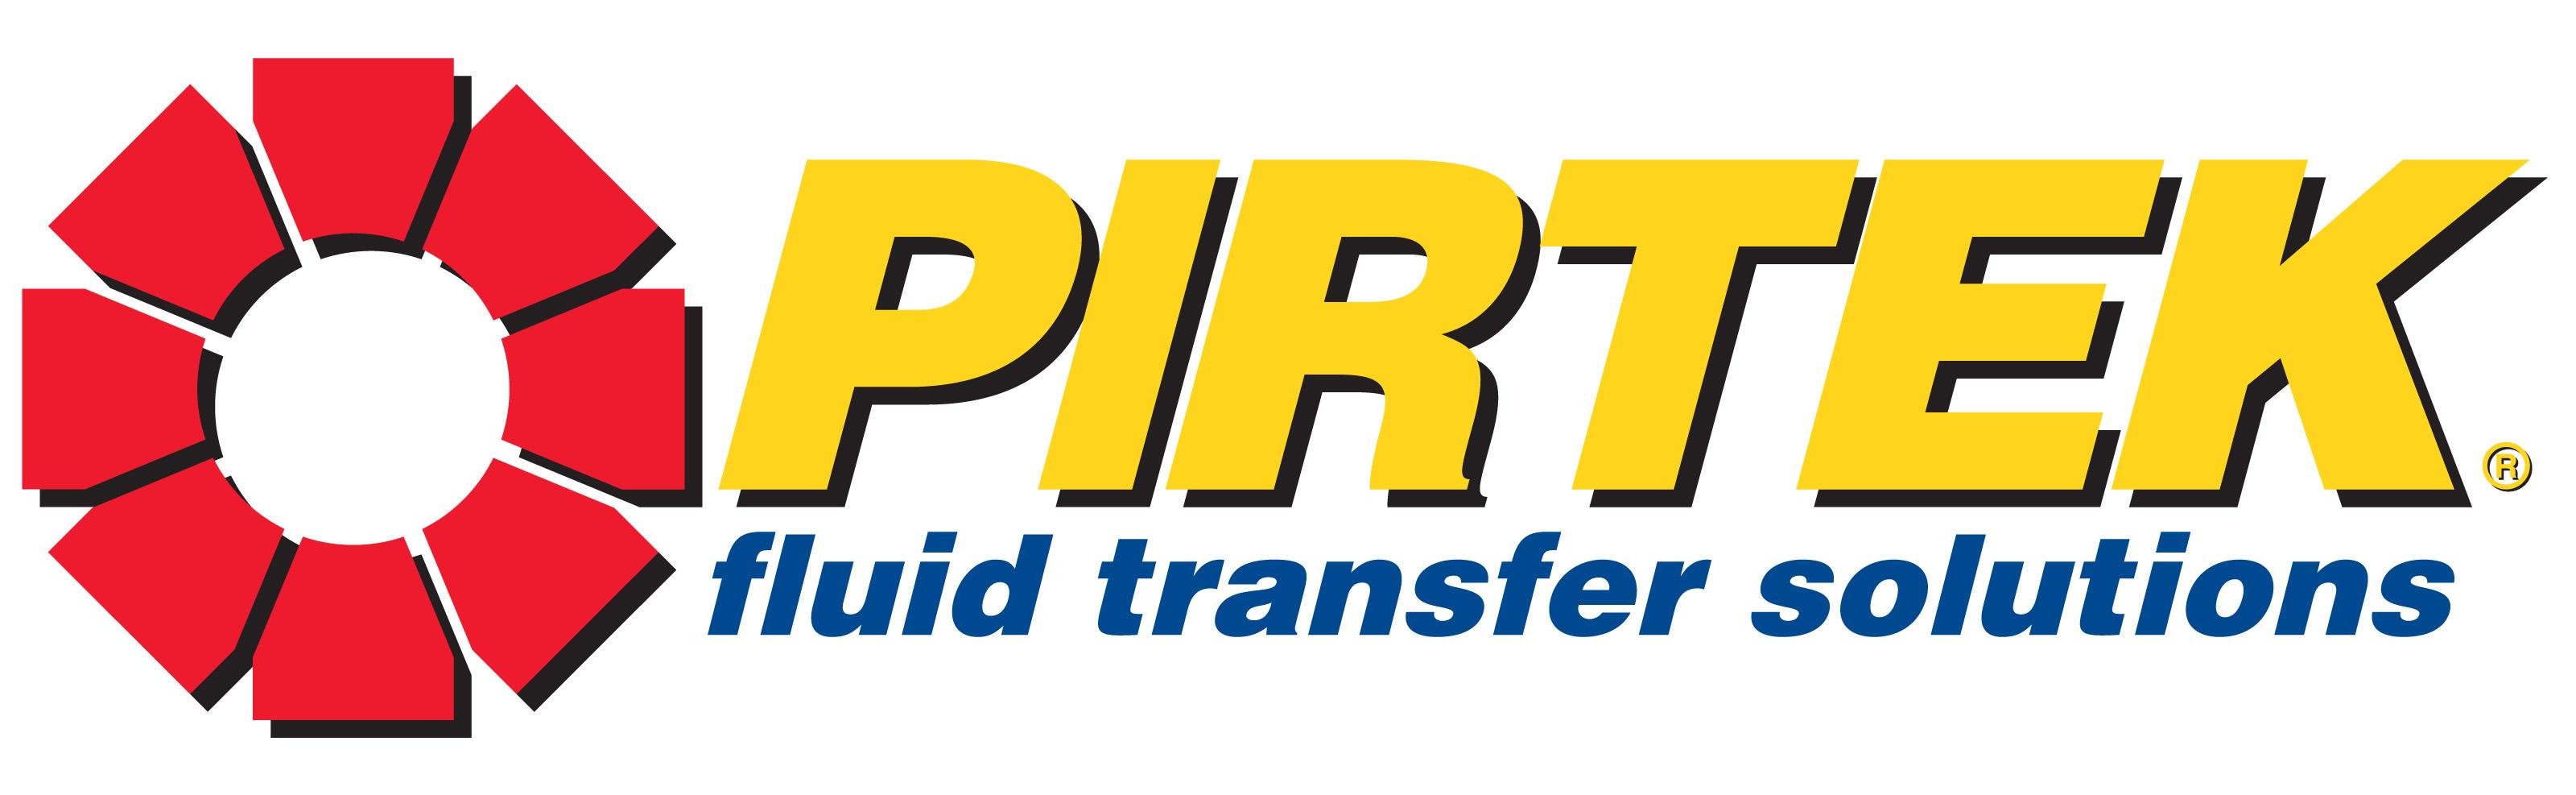 Pirtek company logo